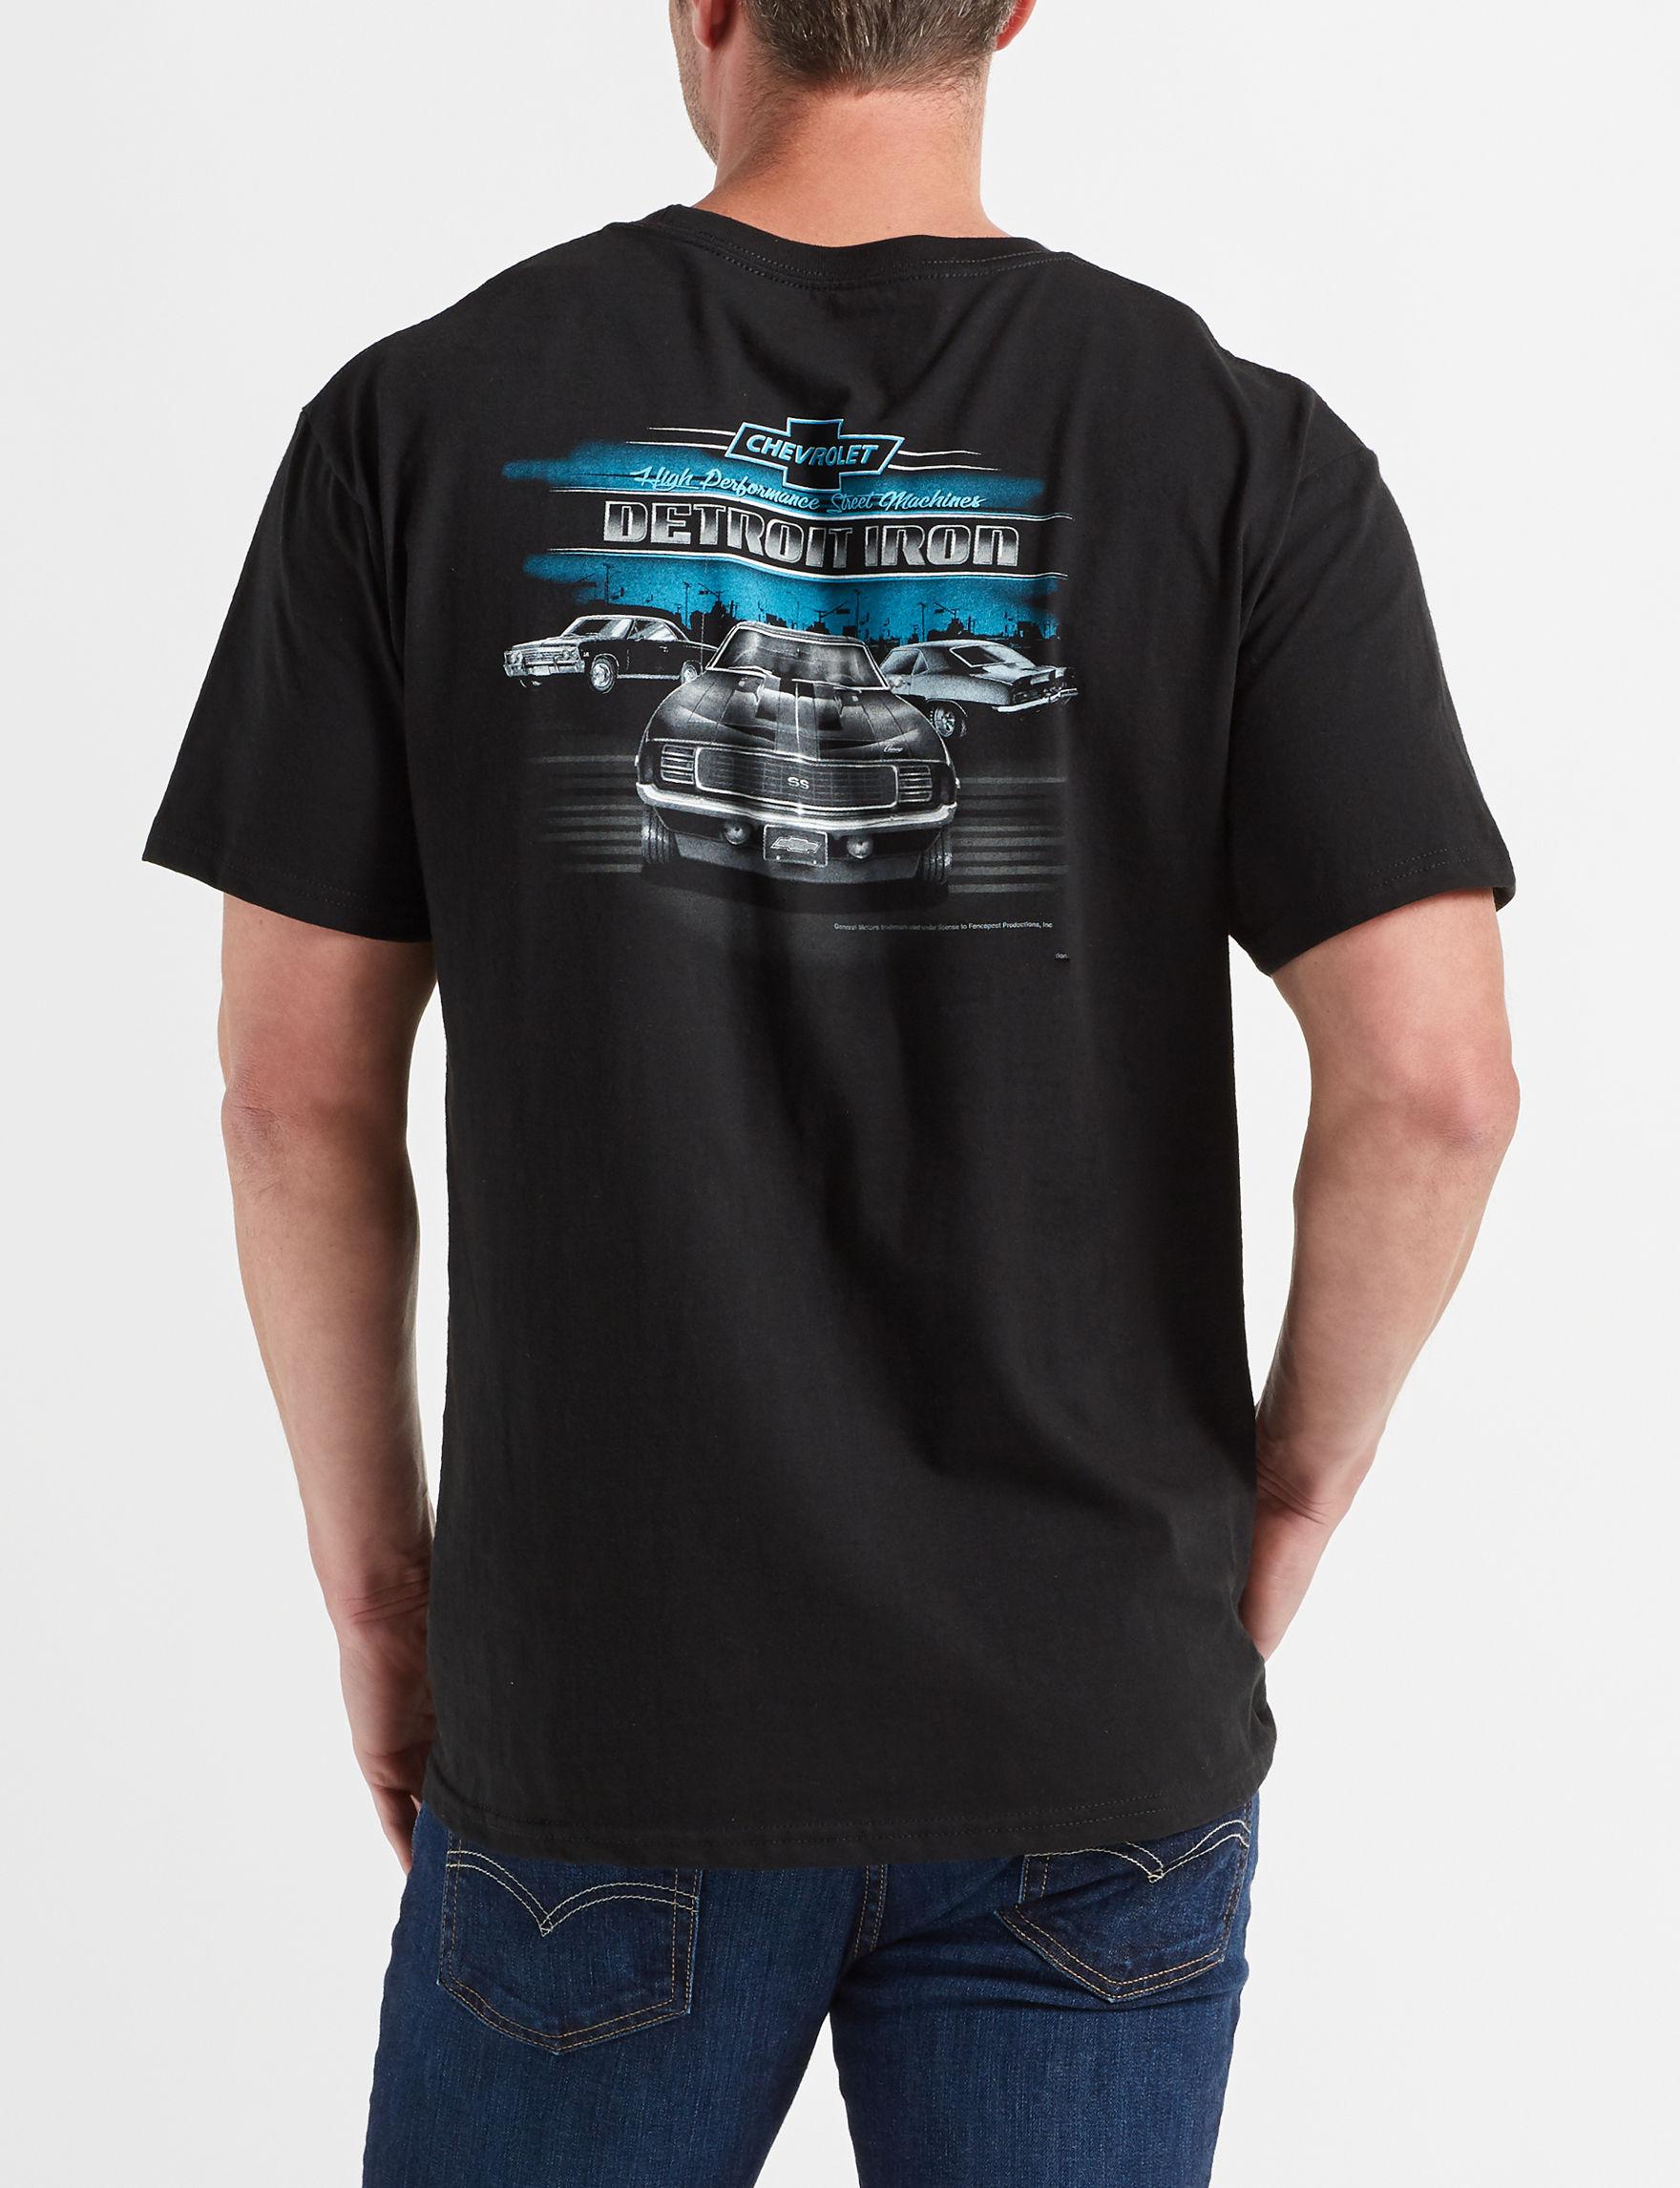 Licensed Black Tees & Tanks